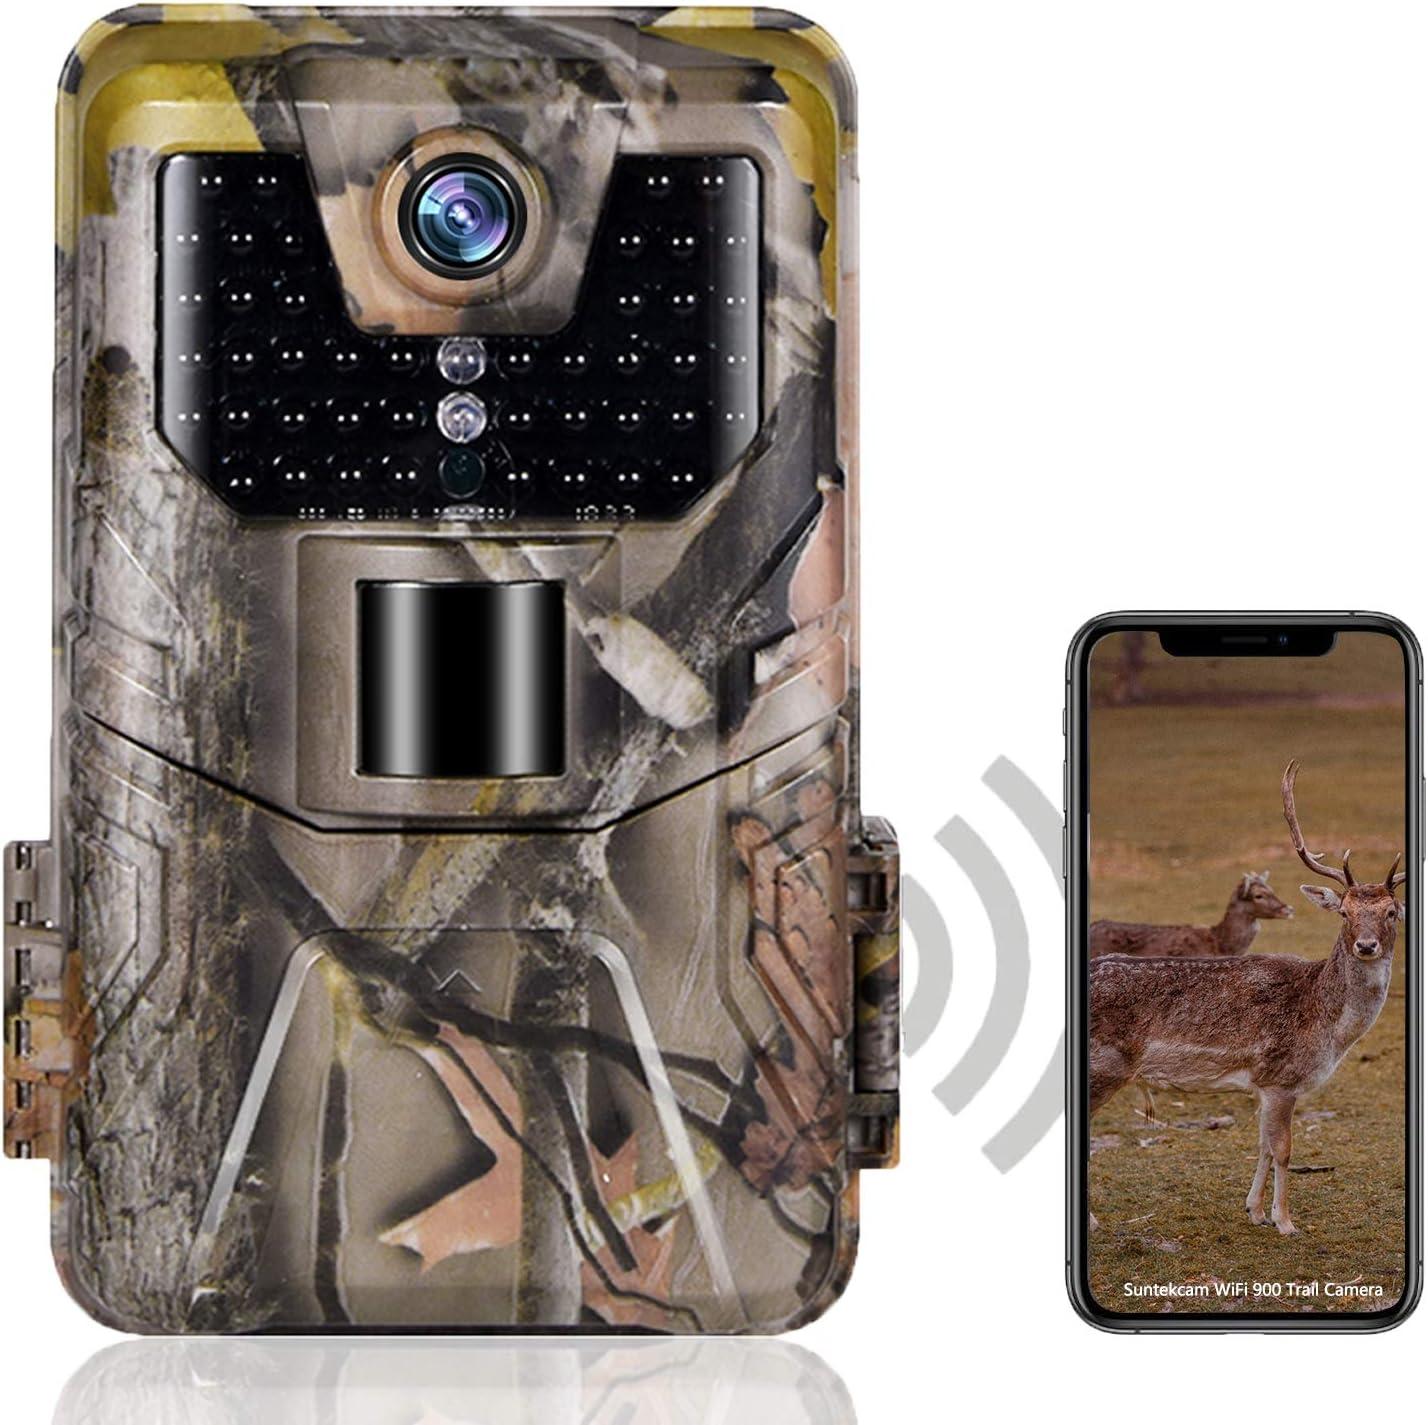 SUNTEKCAM Trail Detroit Mall Camera WiFi Bluetooth Luxury goods Cameras 1296P 24MP Hunting